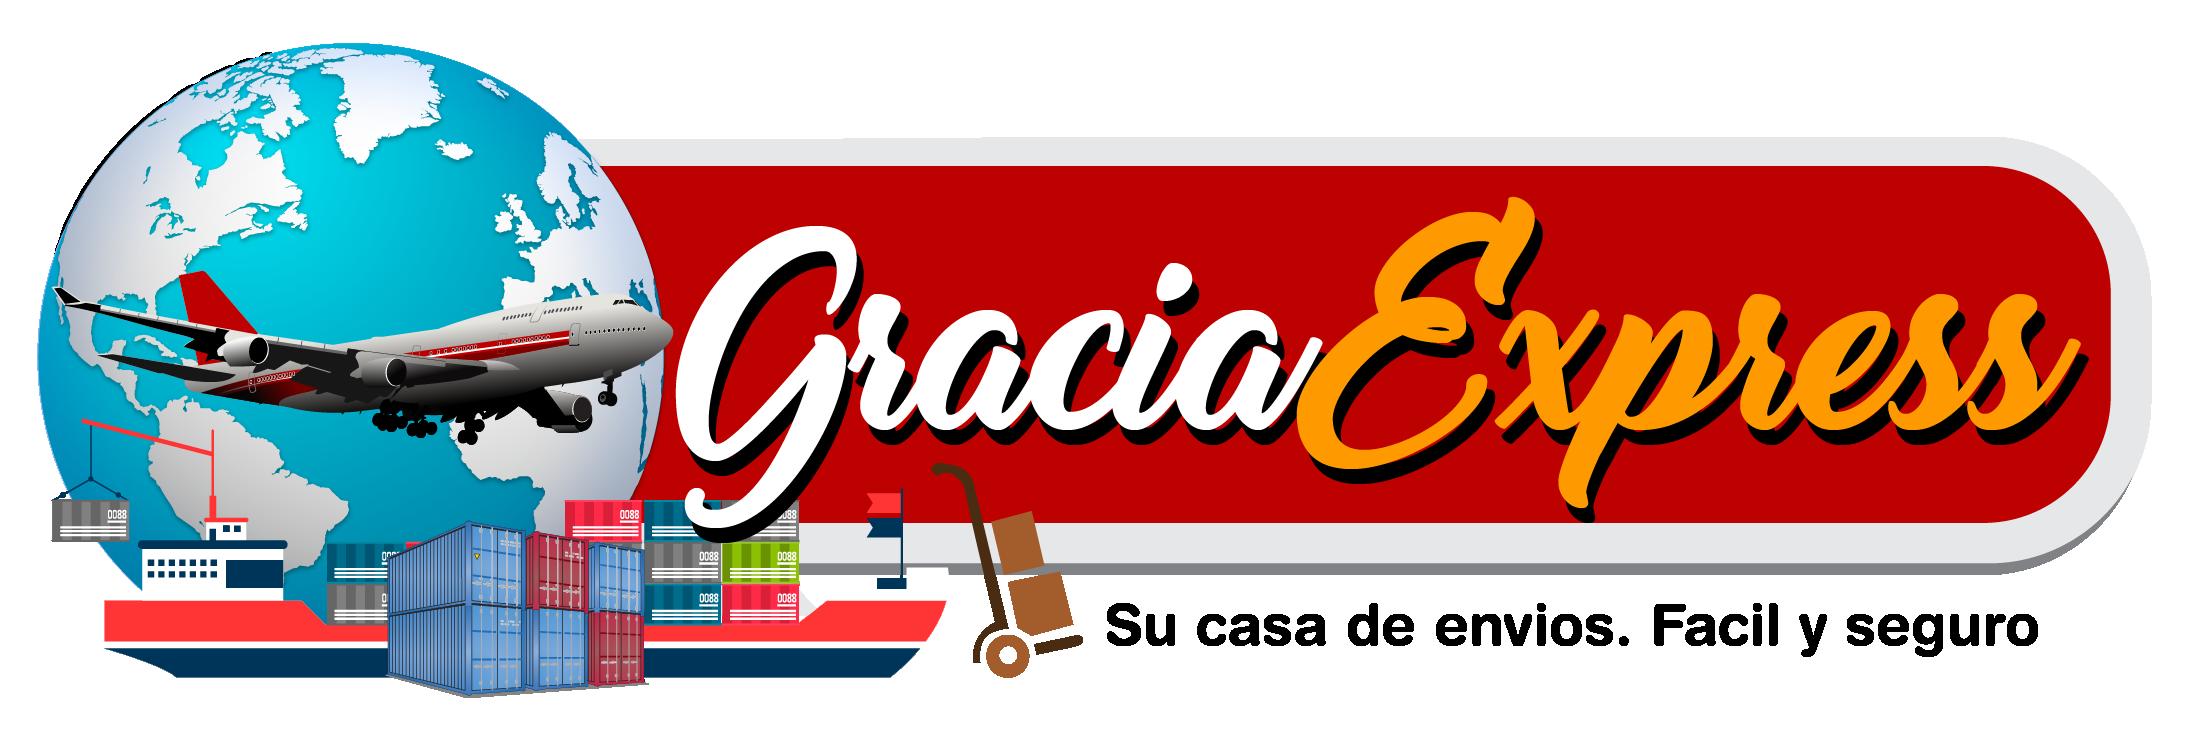 Gracia Express